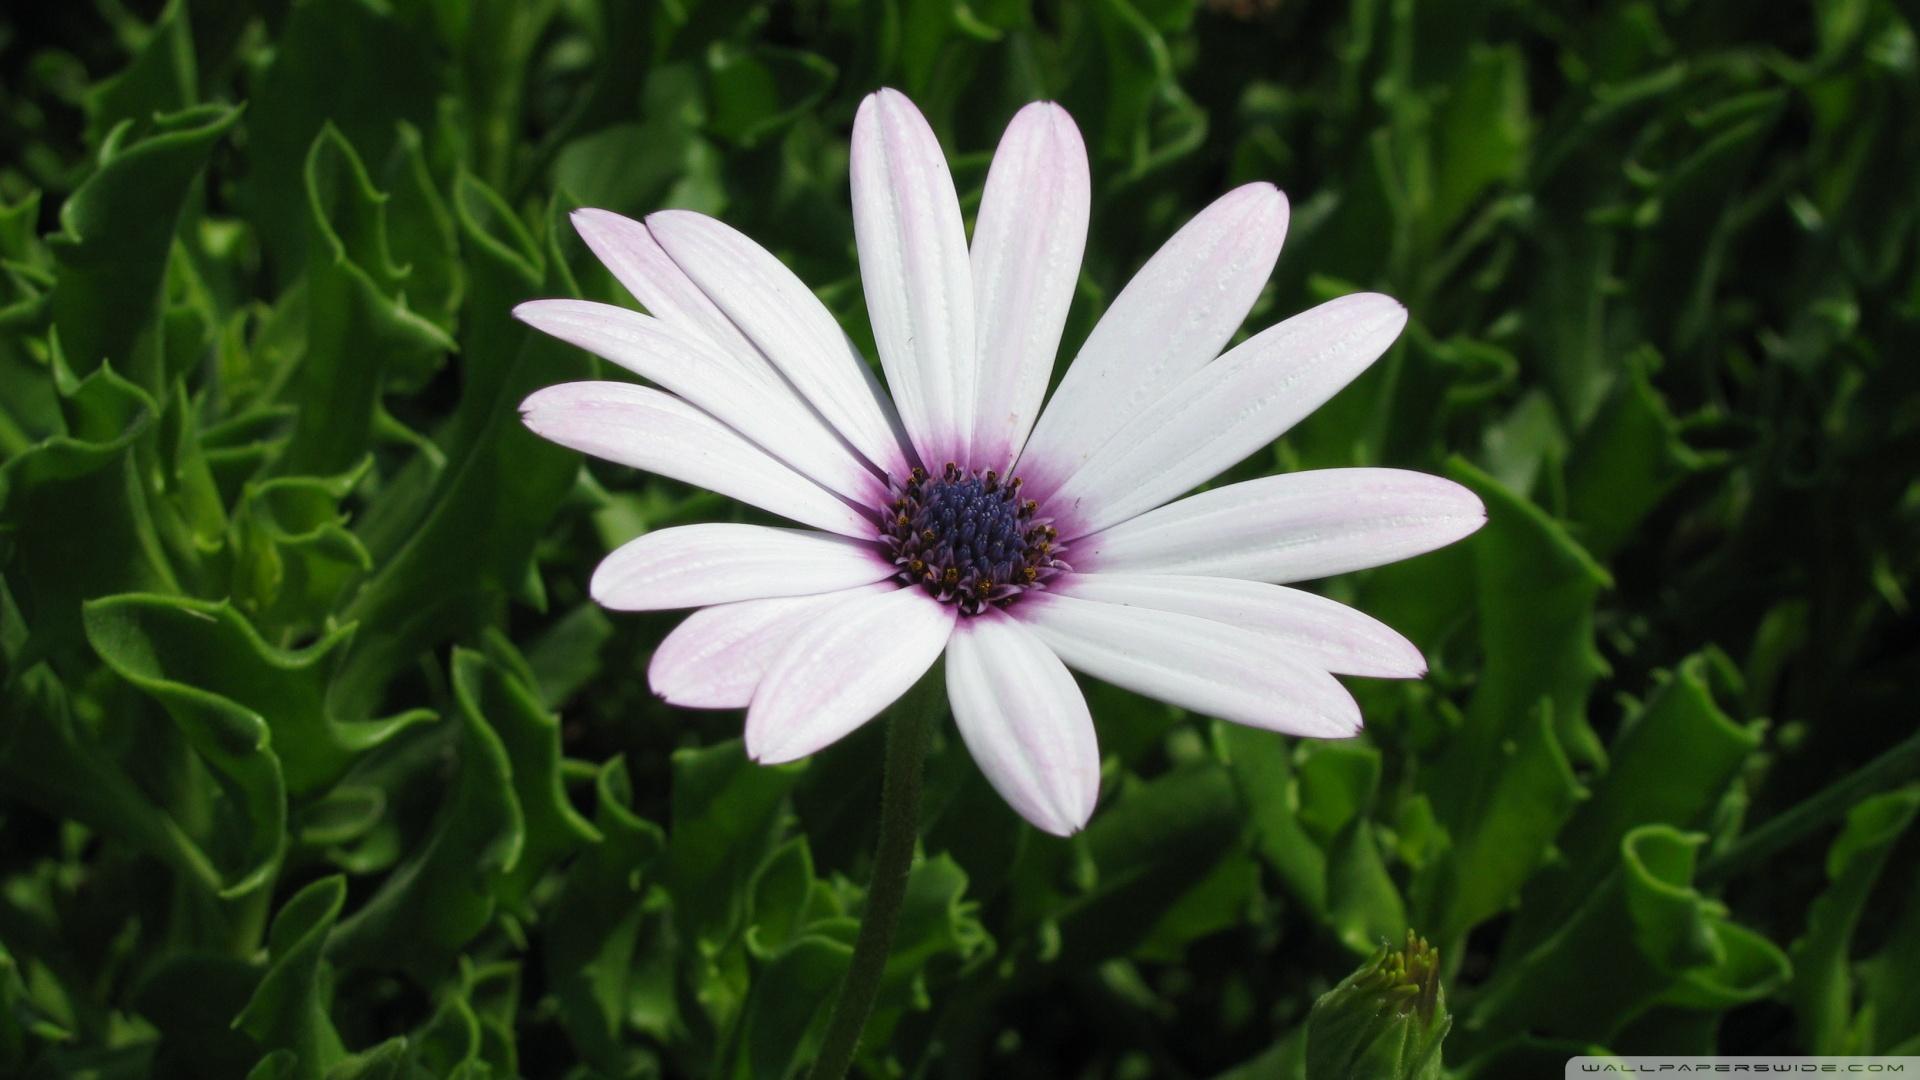 Cape-Daisy-Flower-1920x1080-Cape-Daisy-Flower-wallpaper-wpc5803216